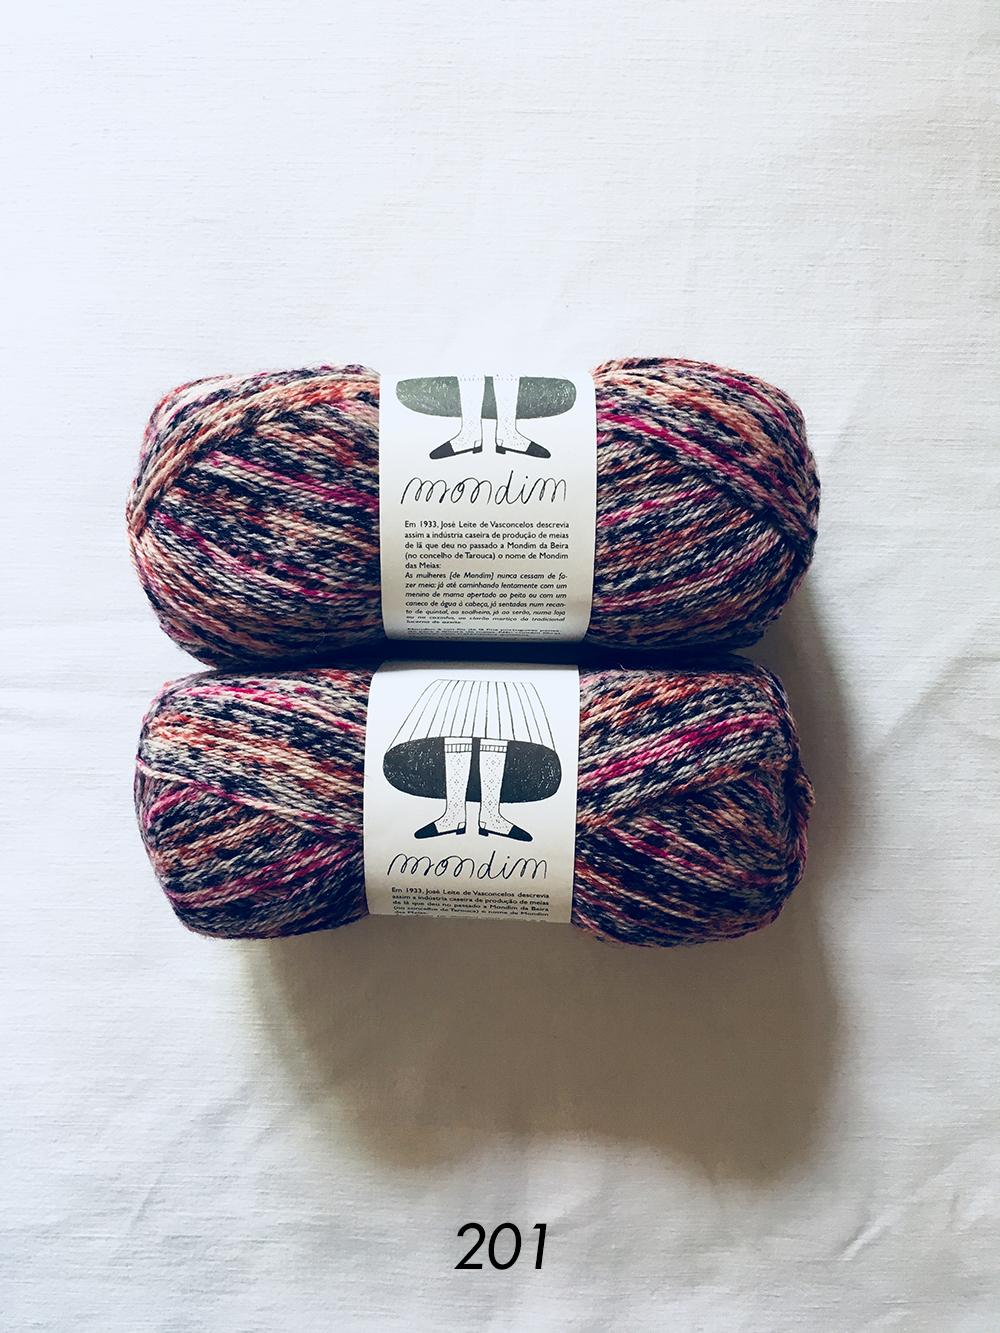 retrosaria_mondim_201_wool_done_knitting.jpg